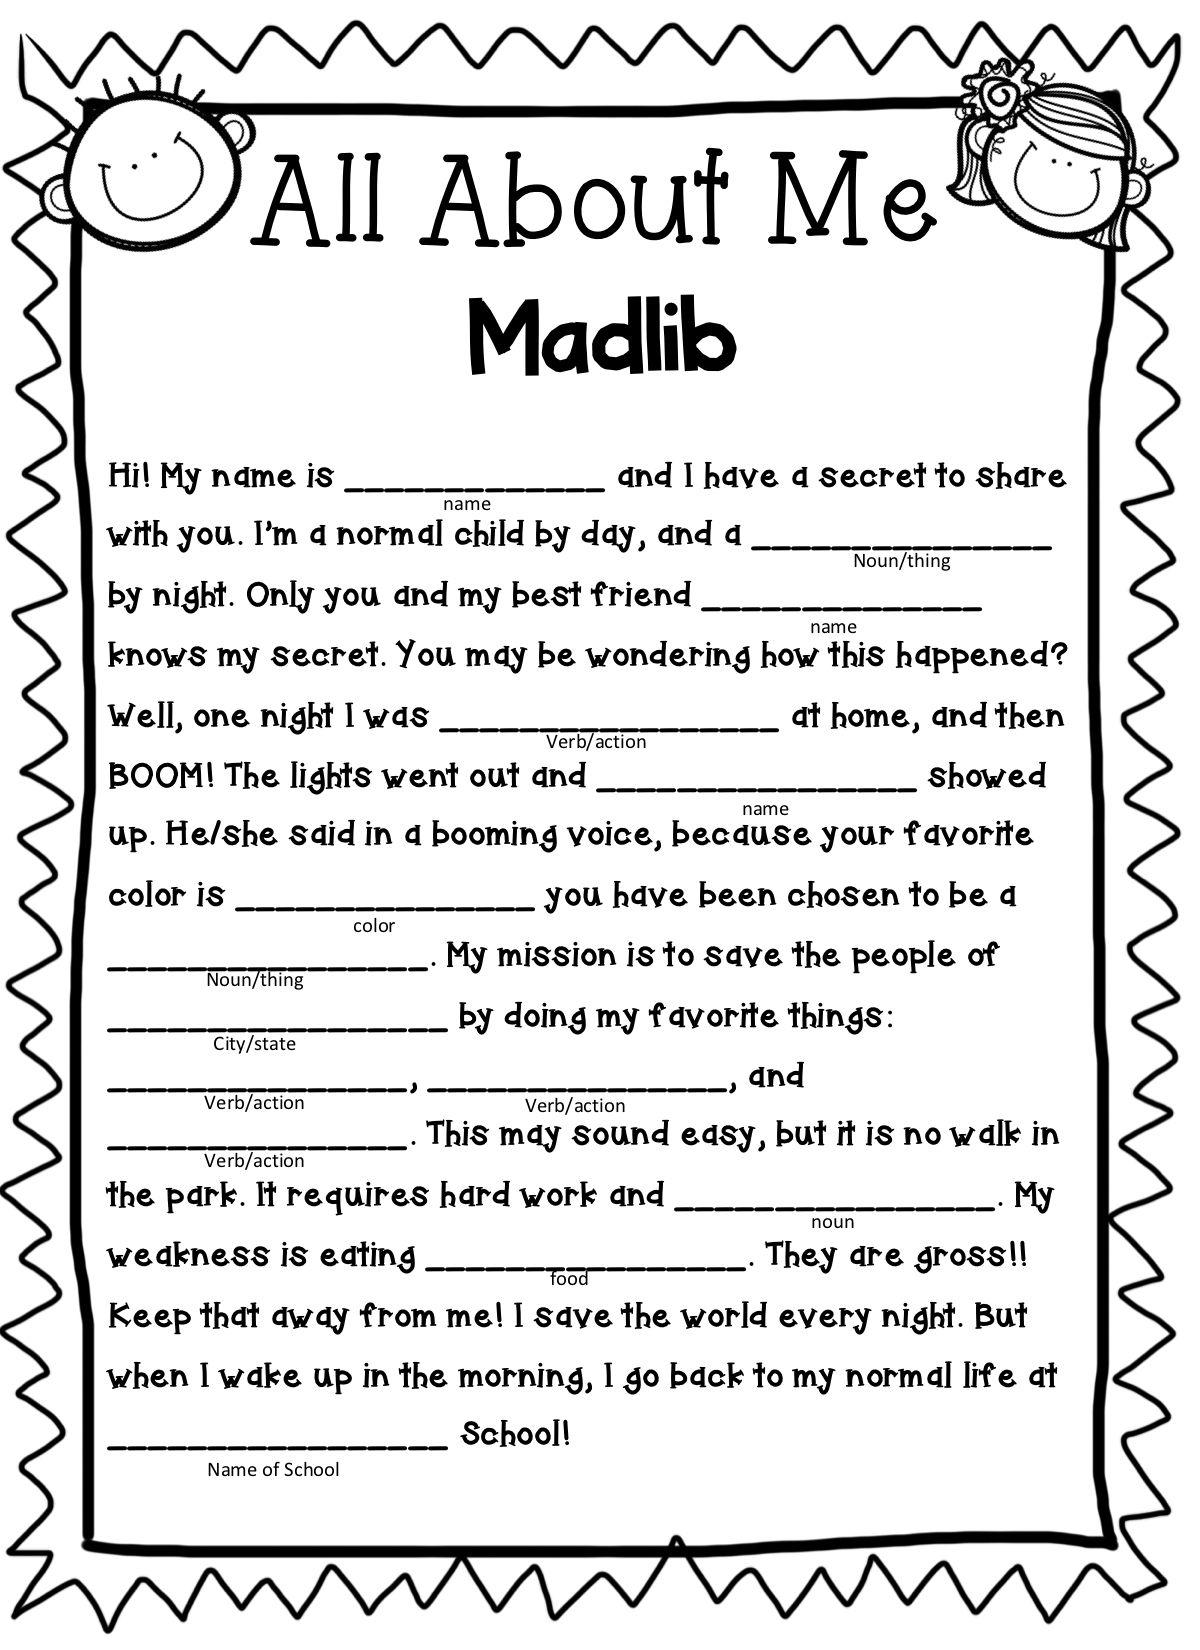 All About Me Madlib Kids Mad Libs Funny Mad Libs Mad Libs [ 1650 x 1200 Pixel ]